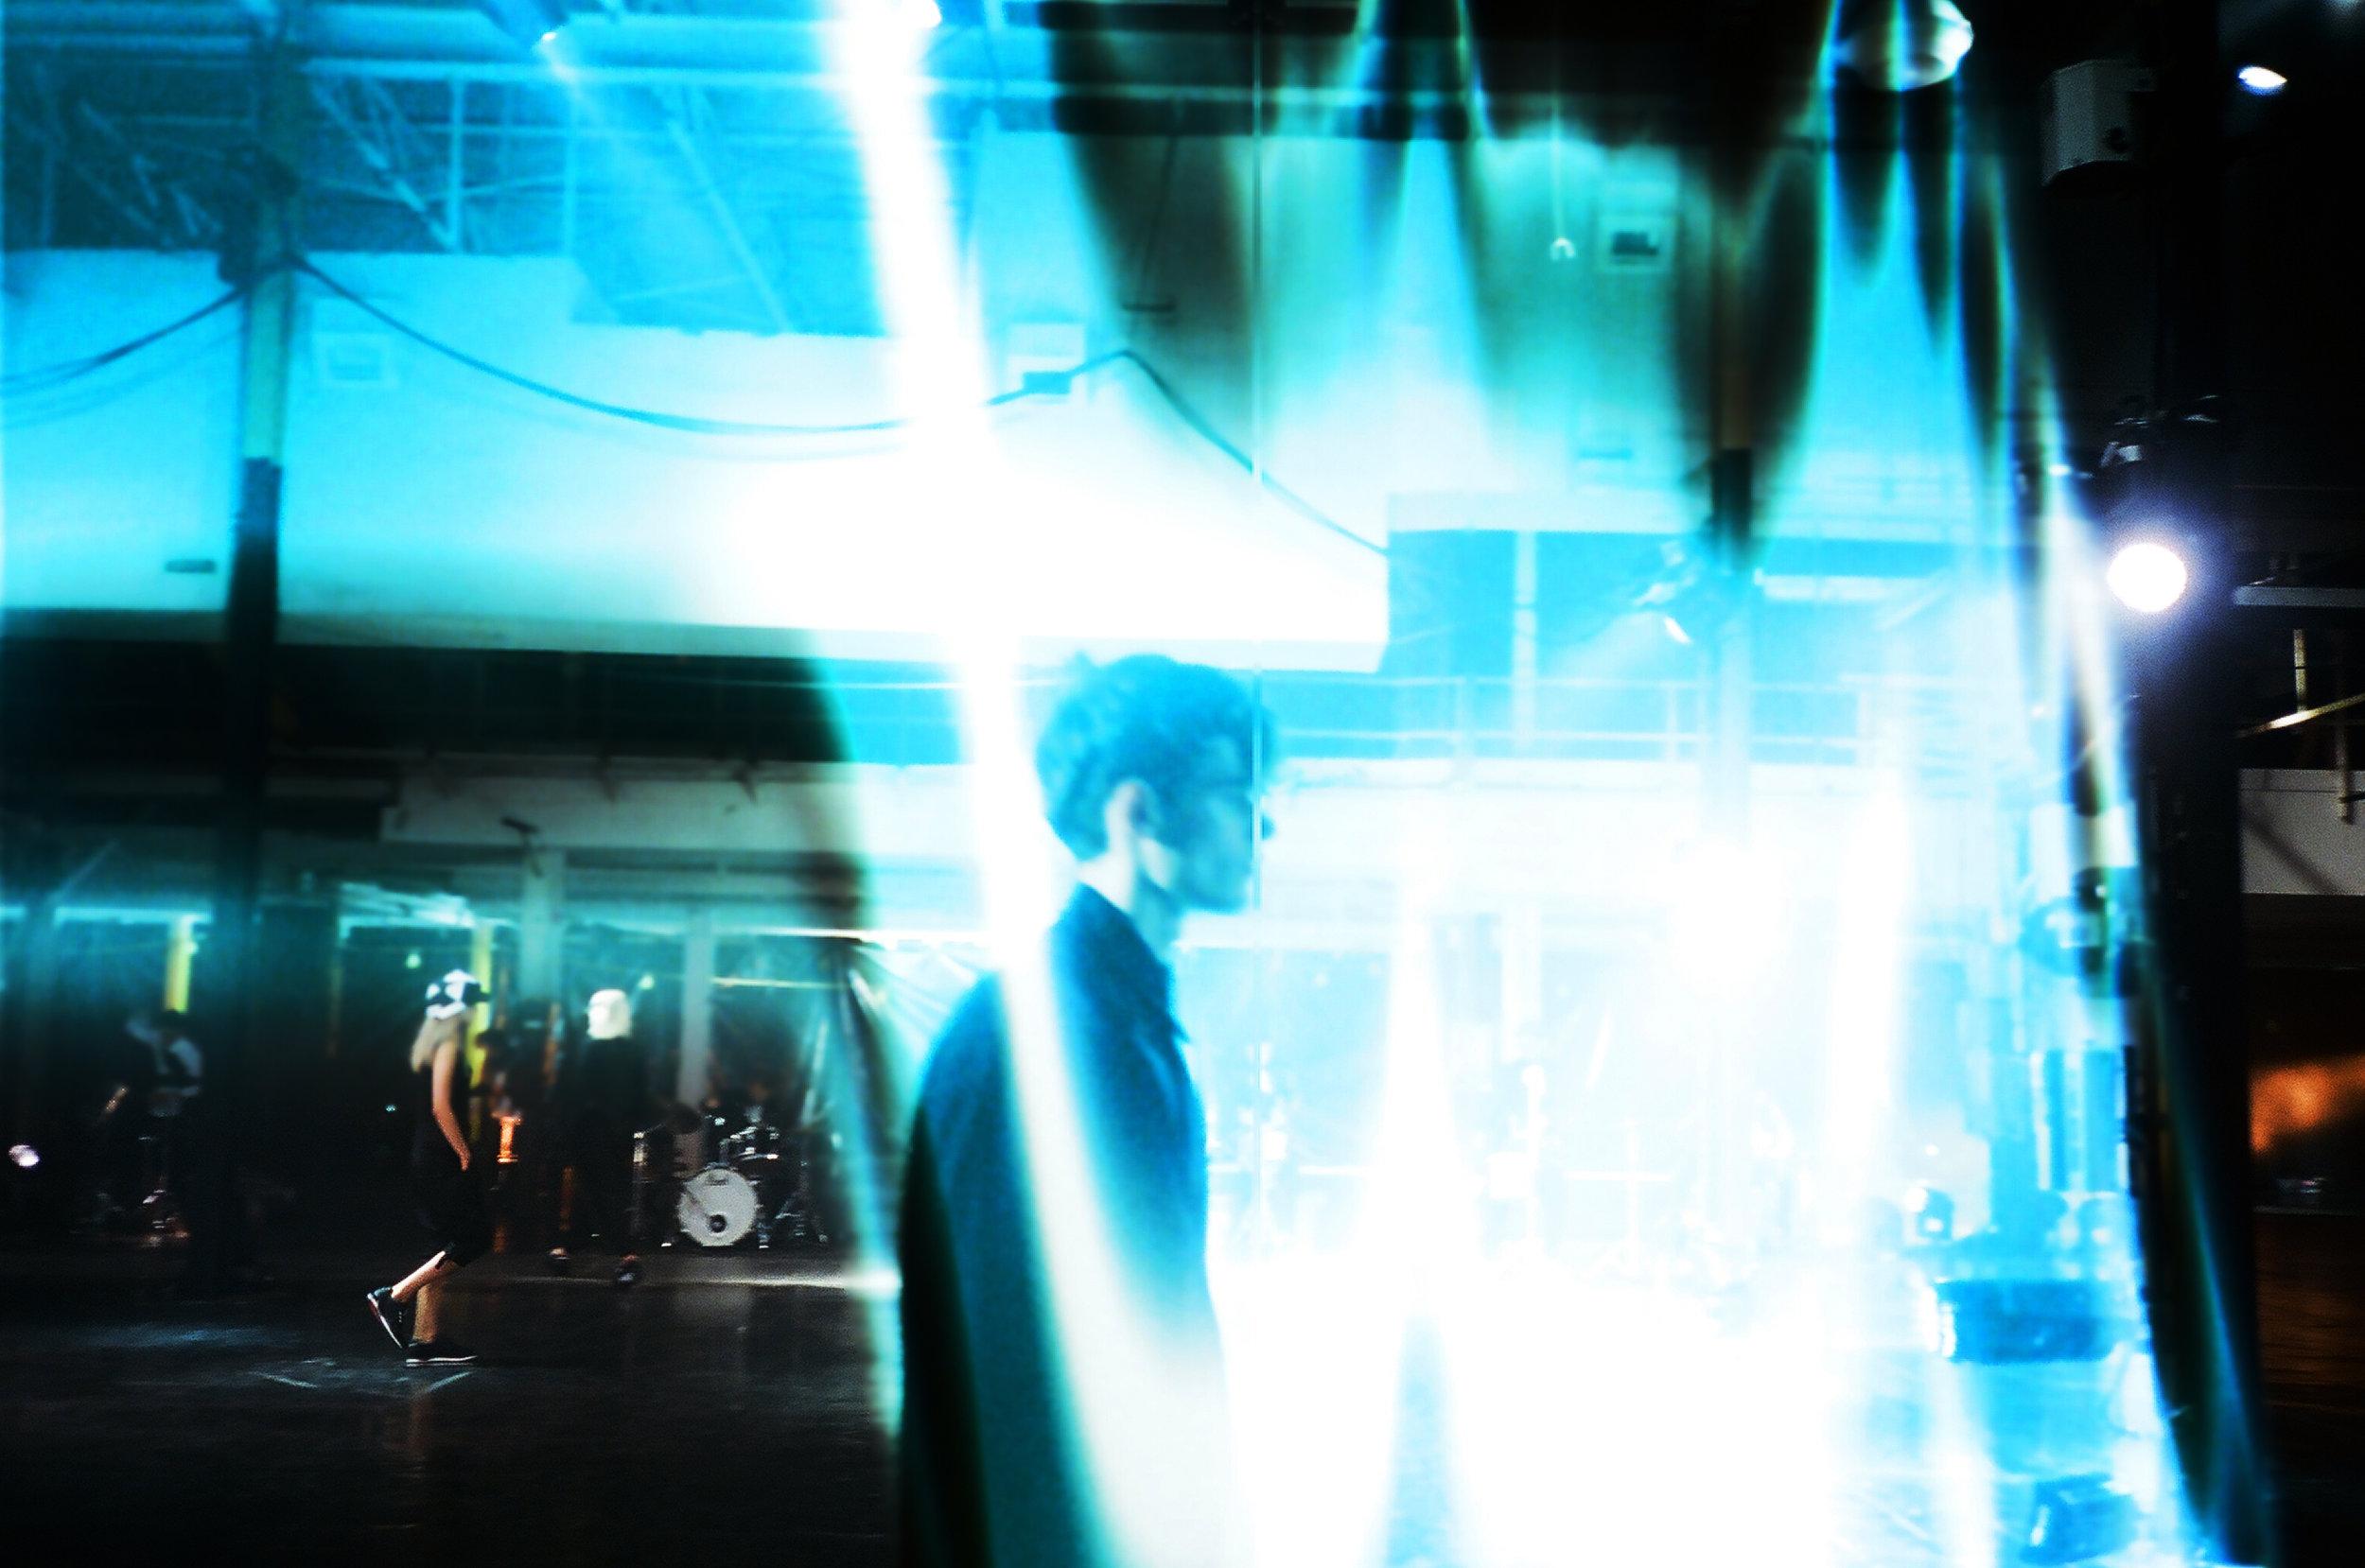 Walking into the Blue Light y-3 Yohji Yamamoto NYFW Photo for The New Yorker by Robin Siegel.jpg